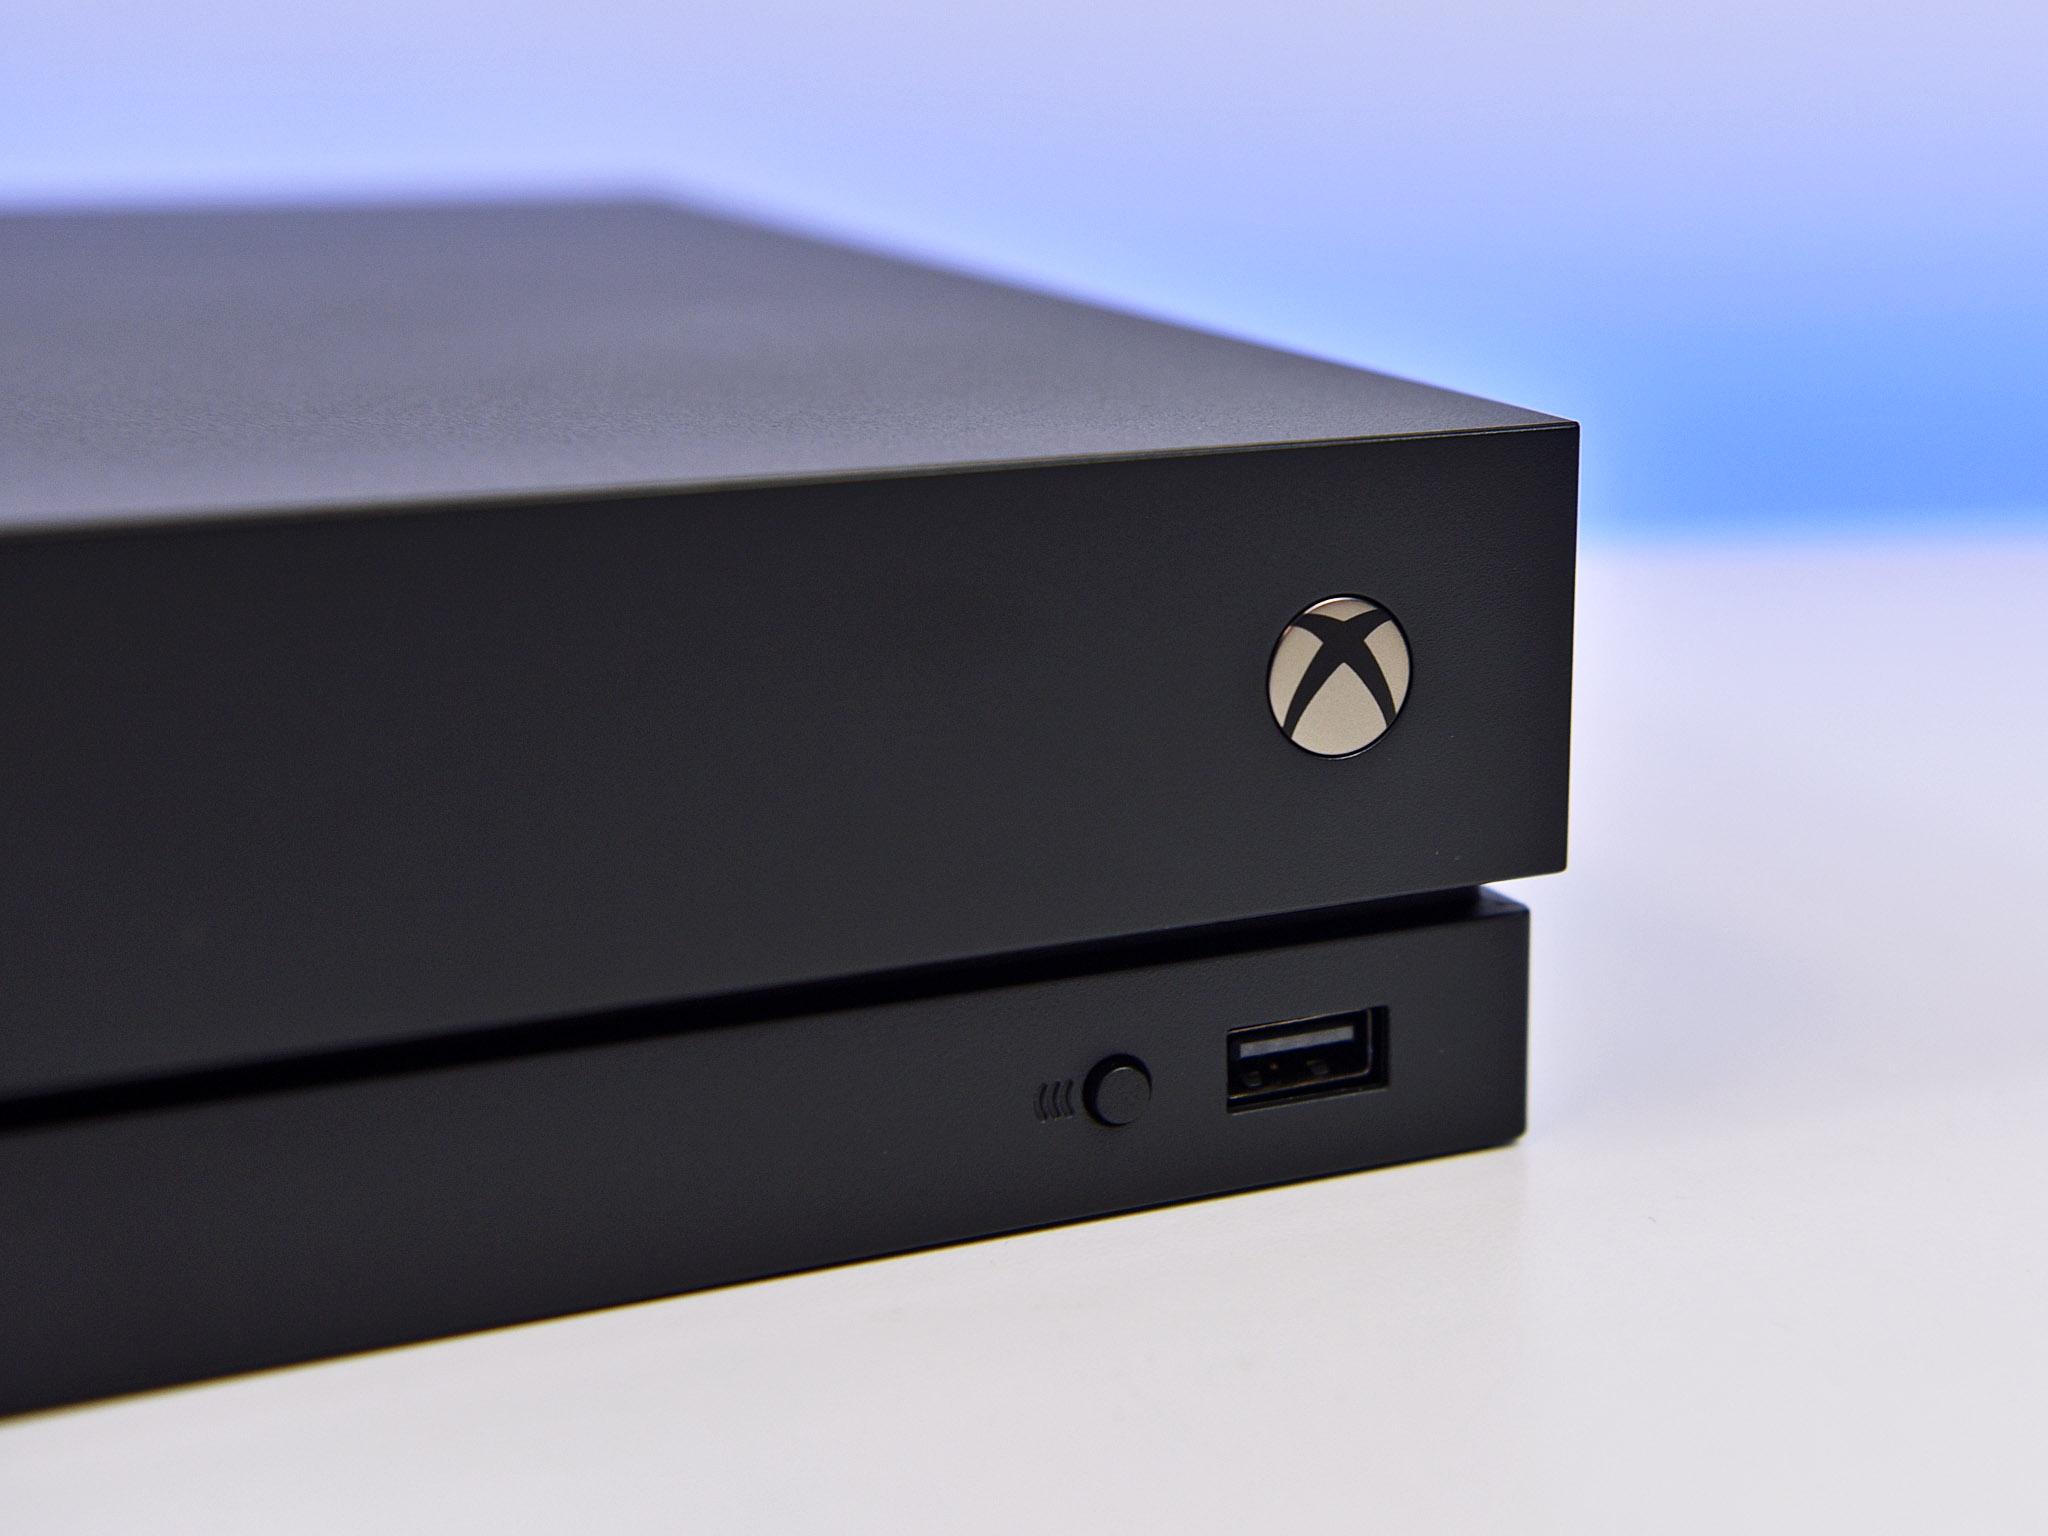 Xbox-One-X-logo-usb_0_0.jpg